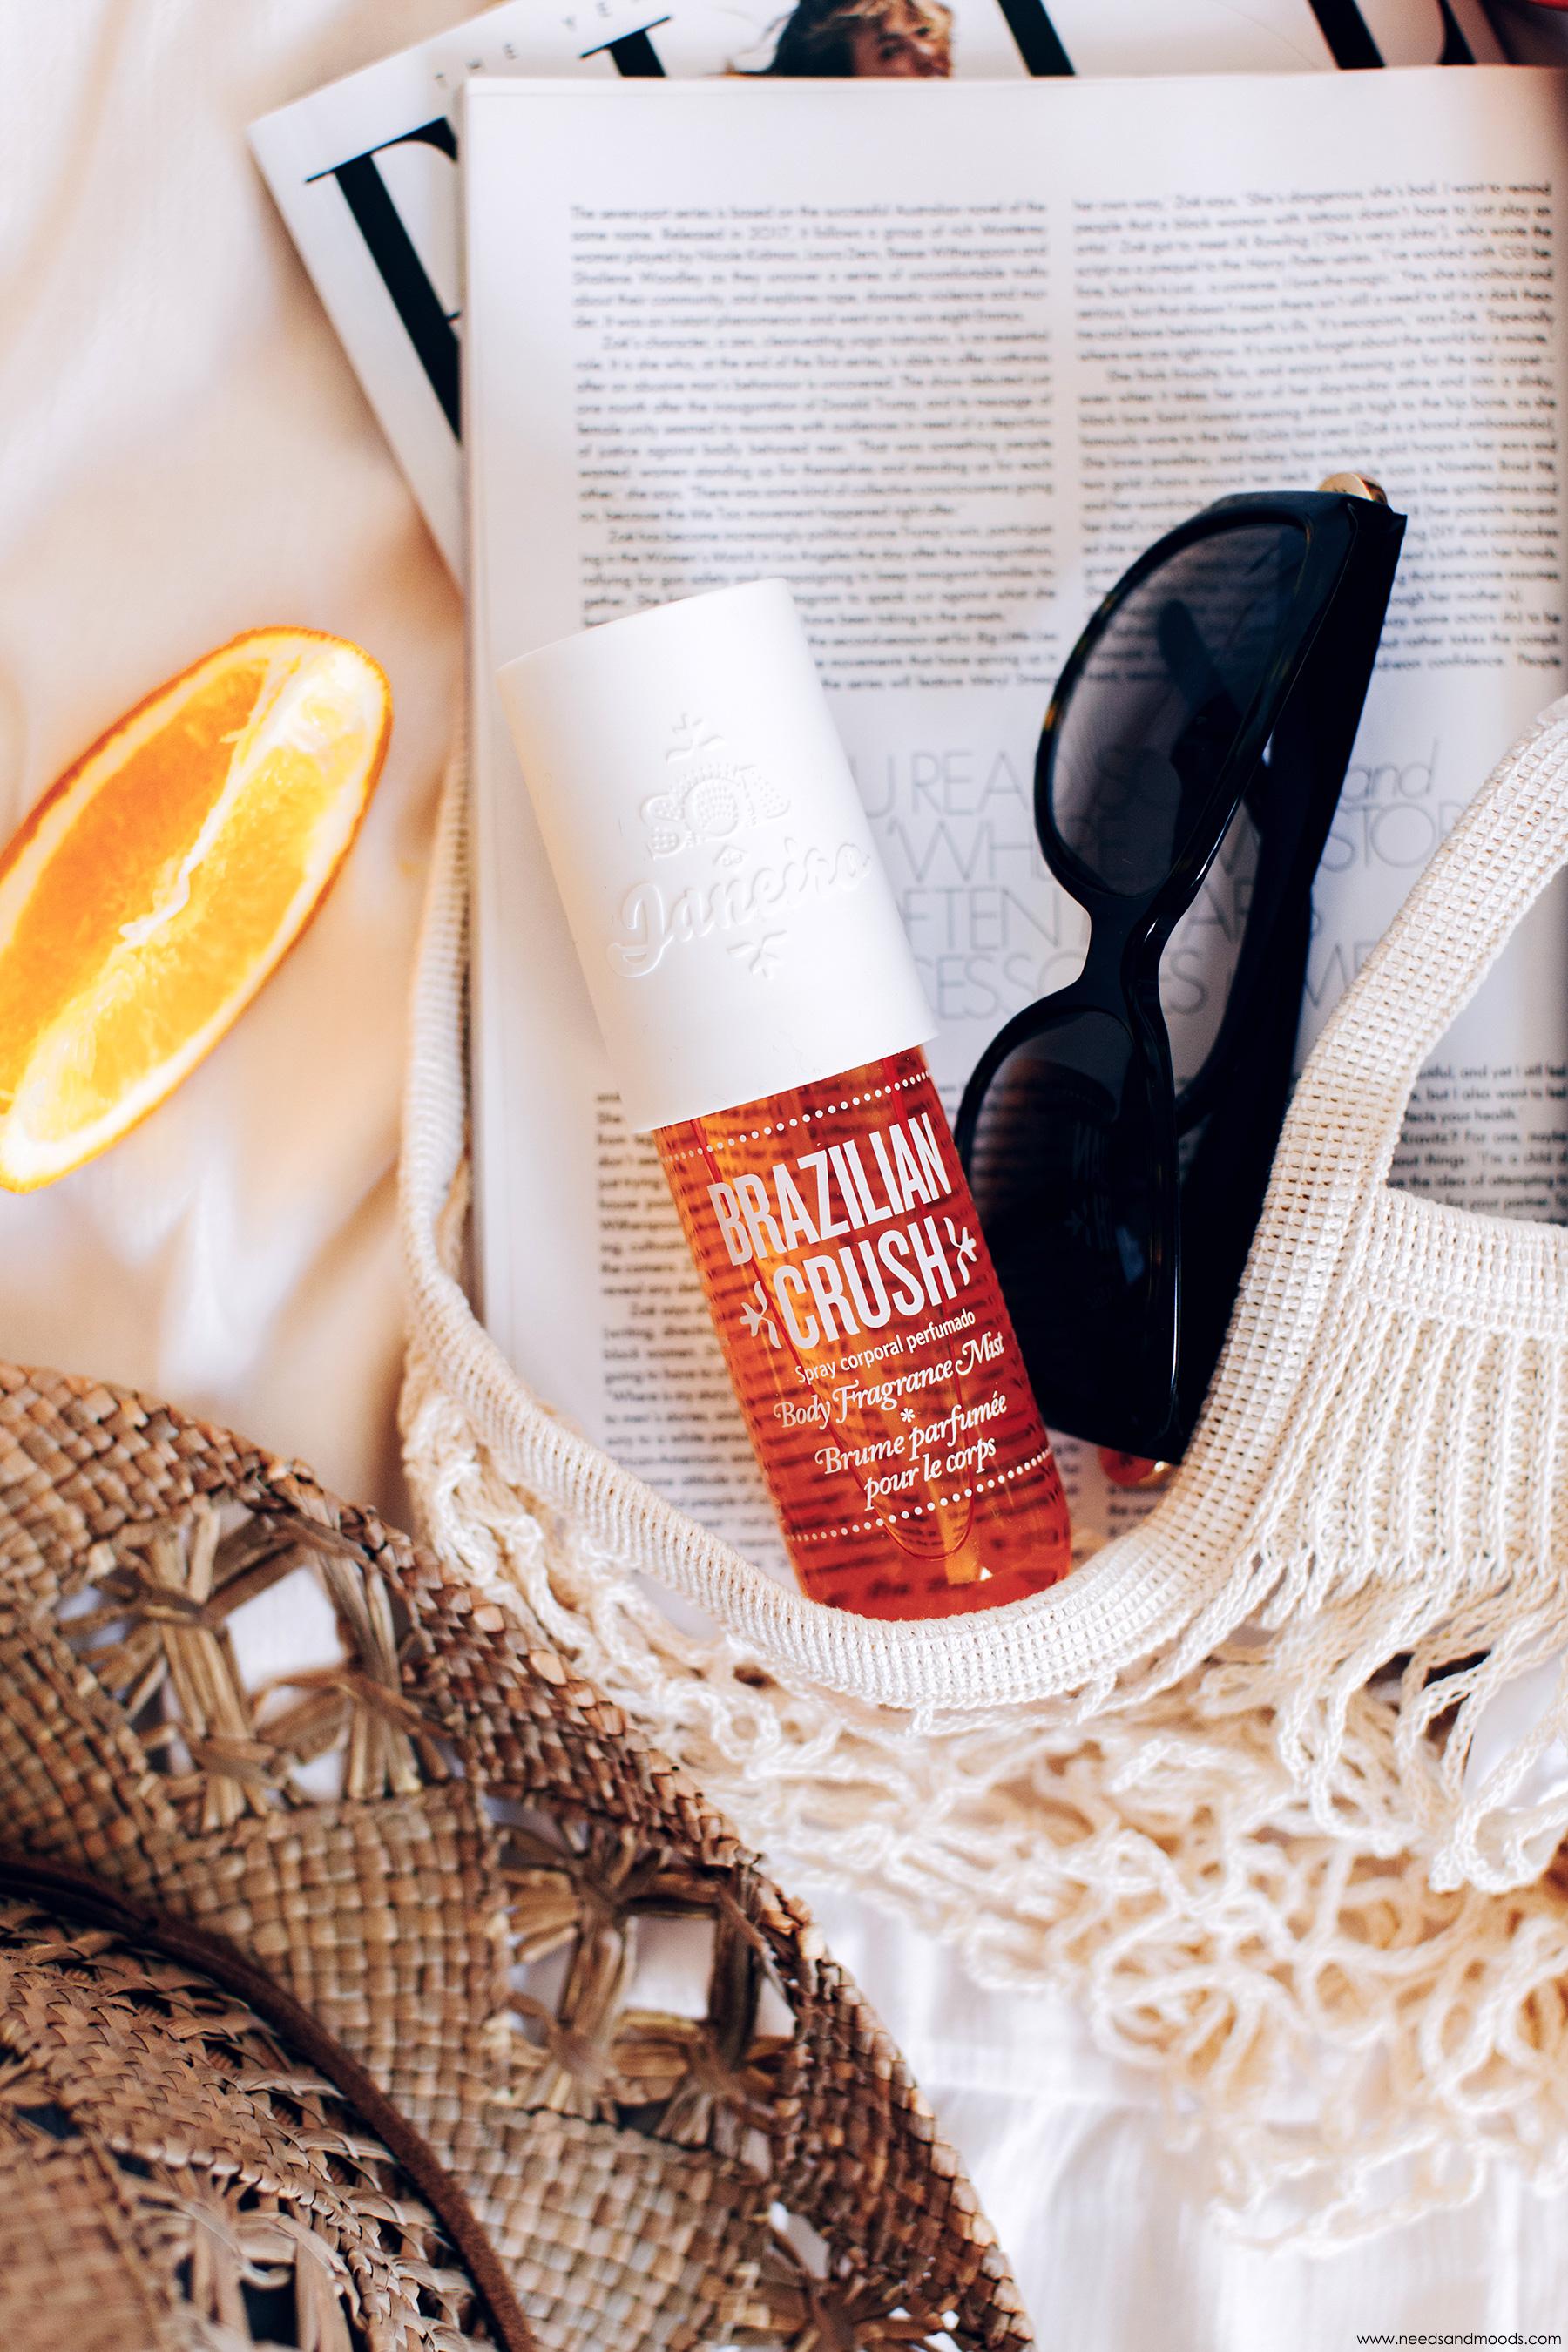 sol de janeiro brazilian crush body fragrance mist avis